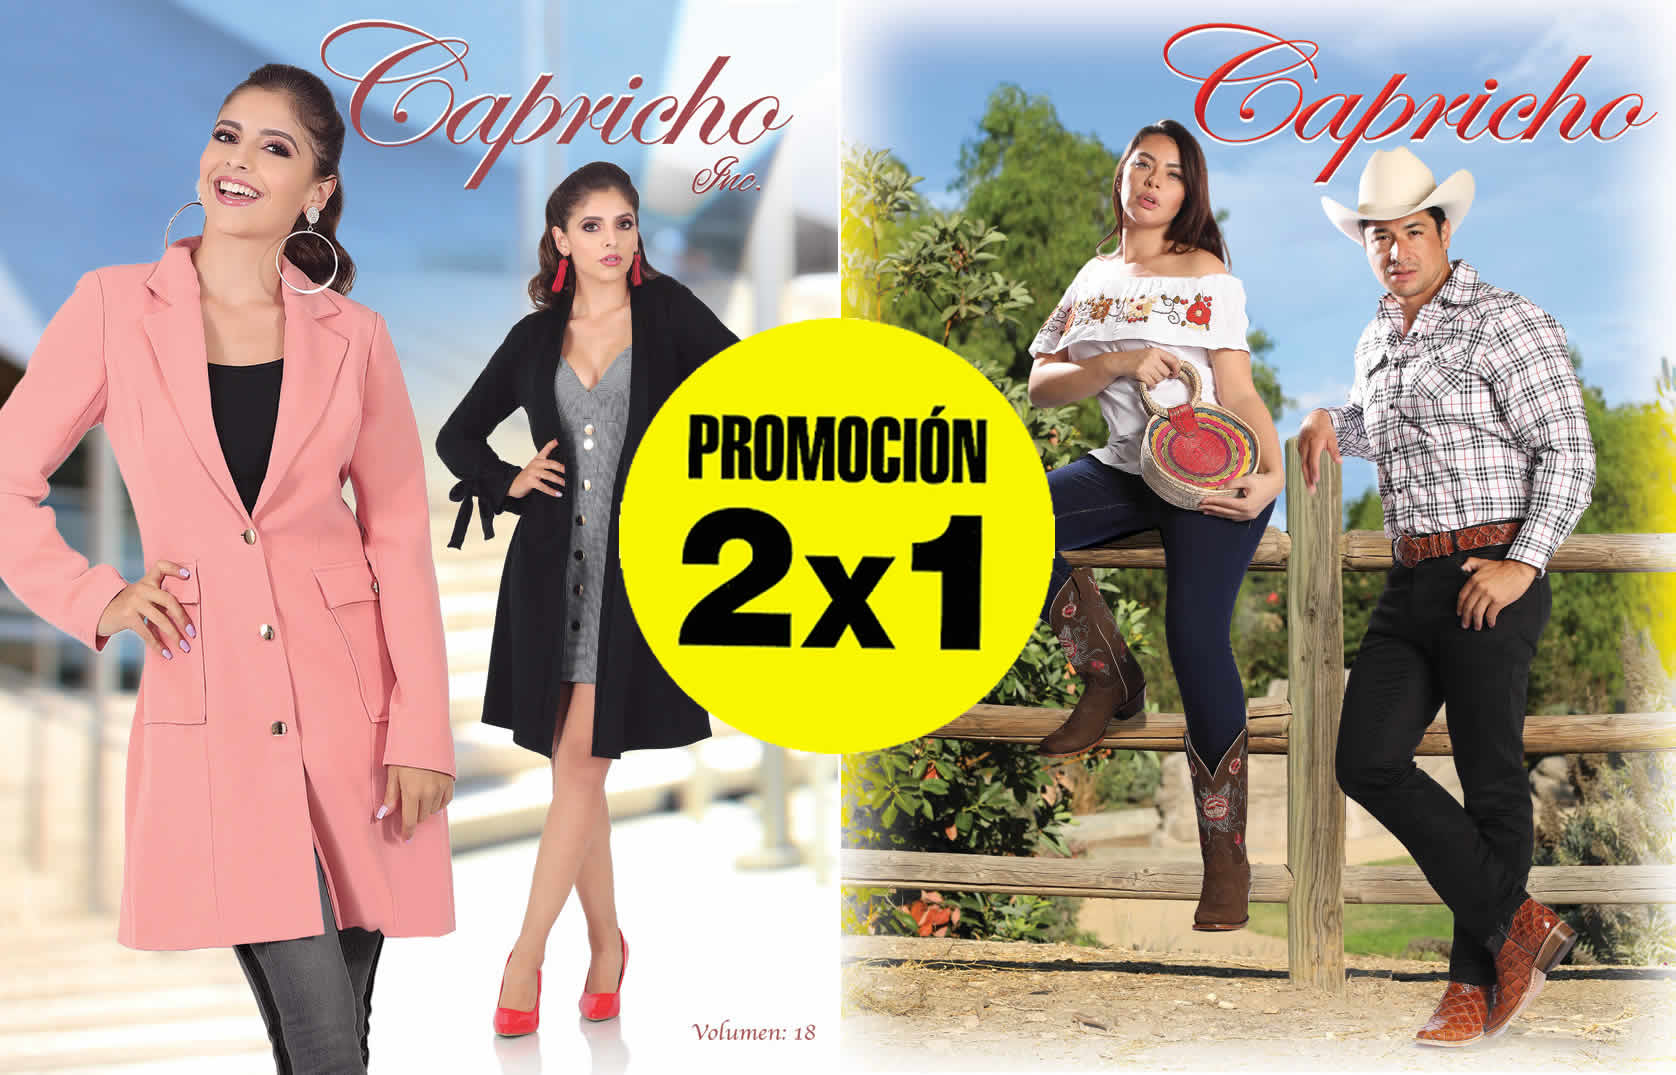 Capricho Inc